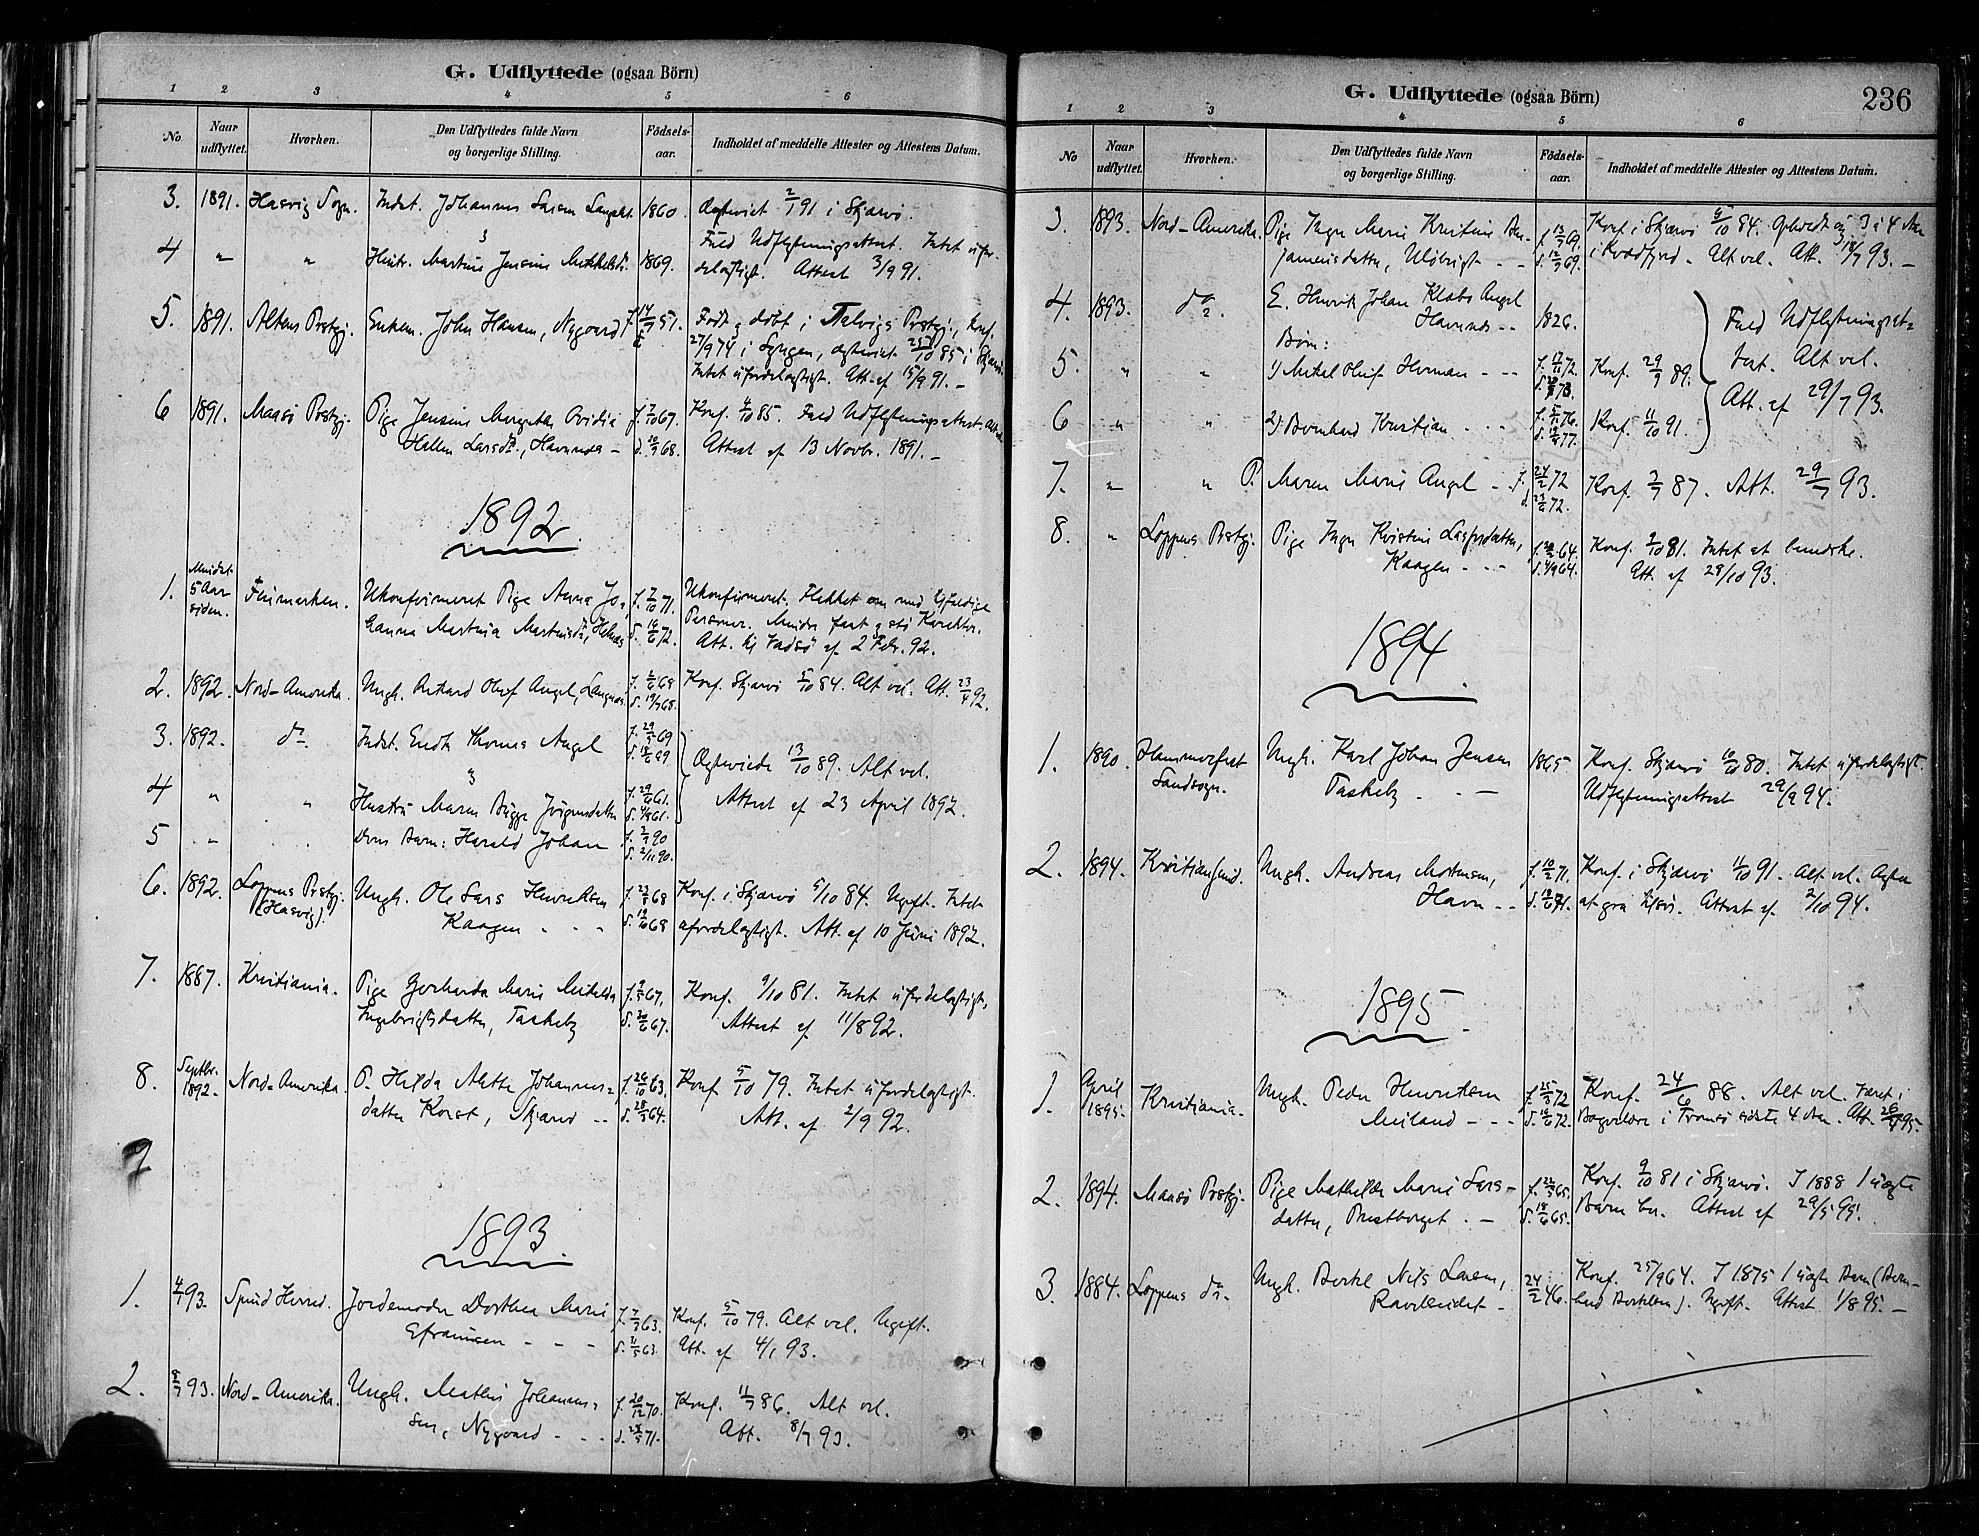 SATØ, Skjervøy sokneprestkontor, H/Ha/Haa/L0010kirke: Ministerialbok nr. 10, 1887-1898, s. 236